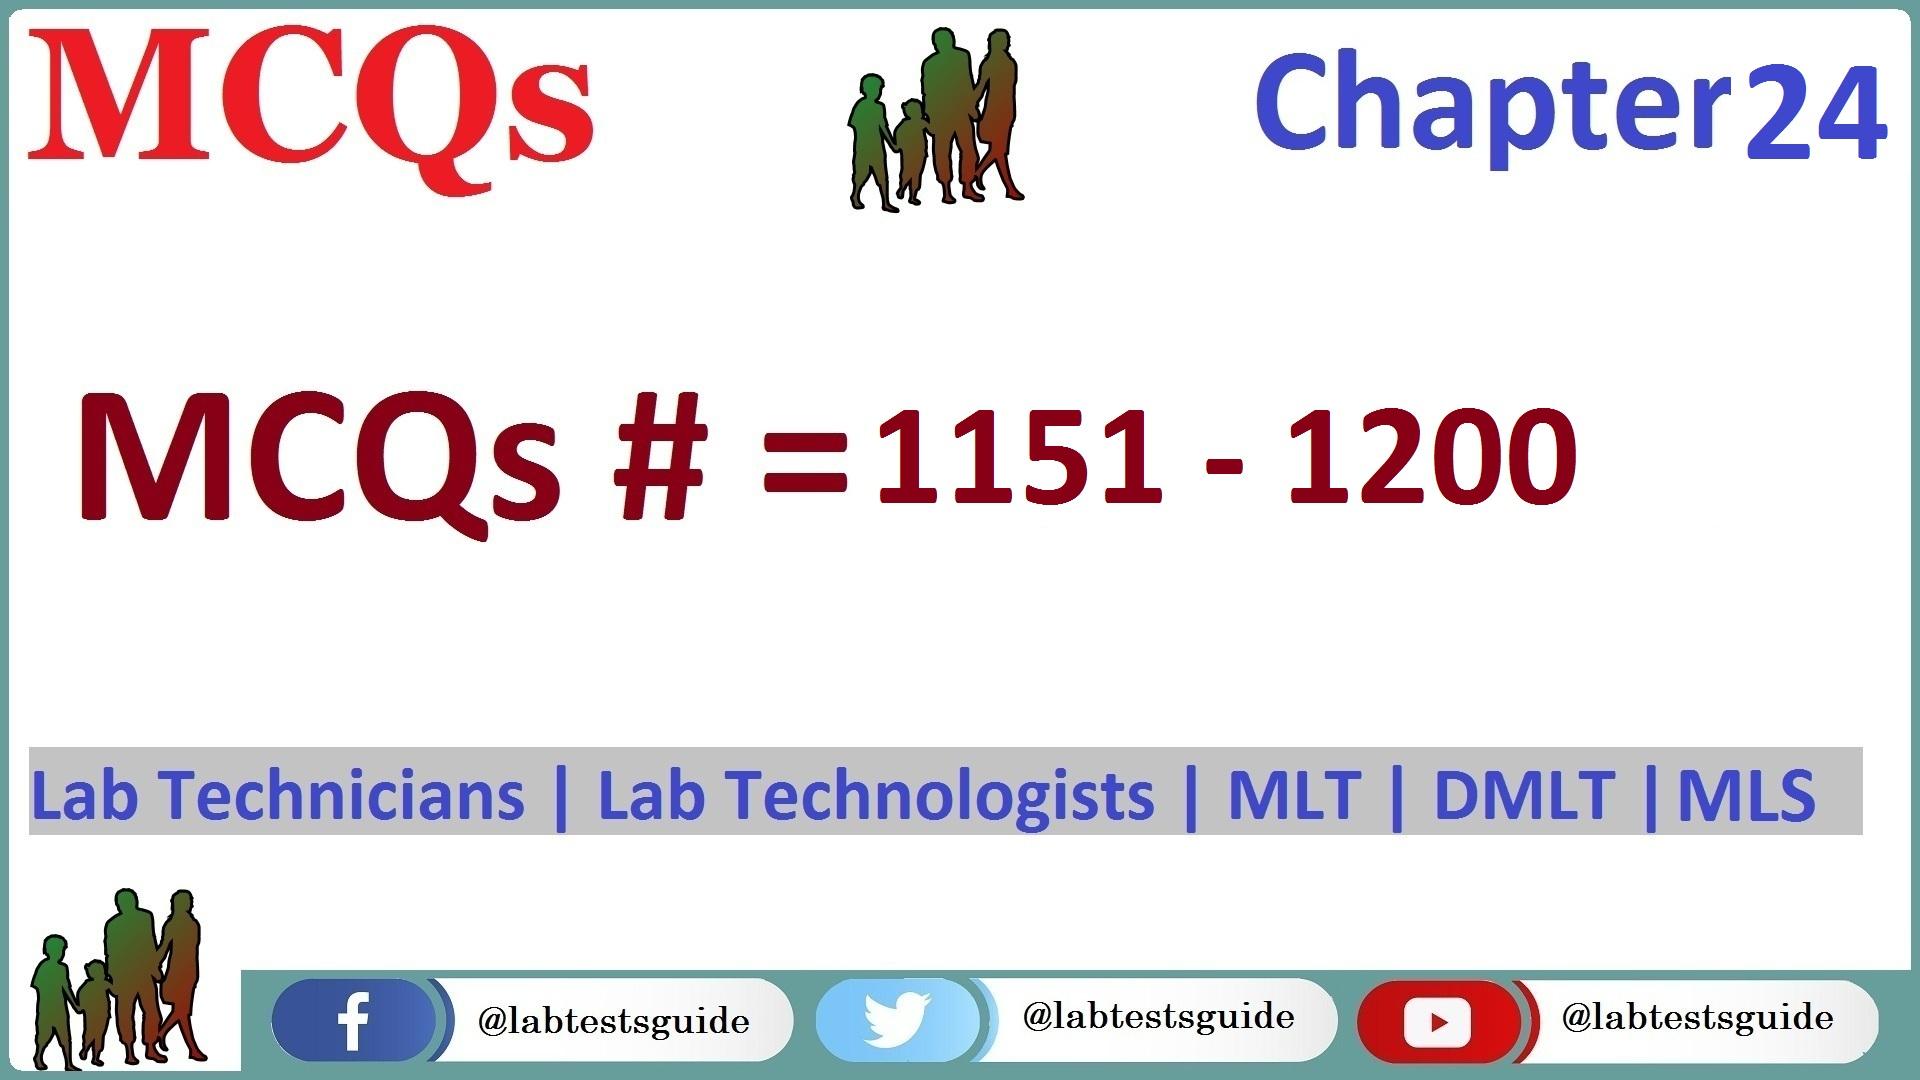 MCQs Chapter 24